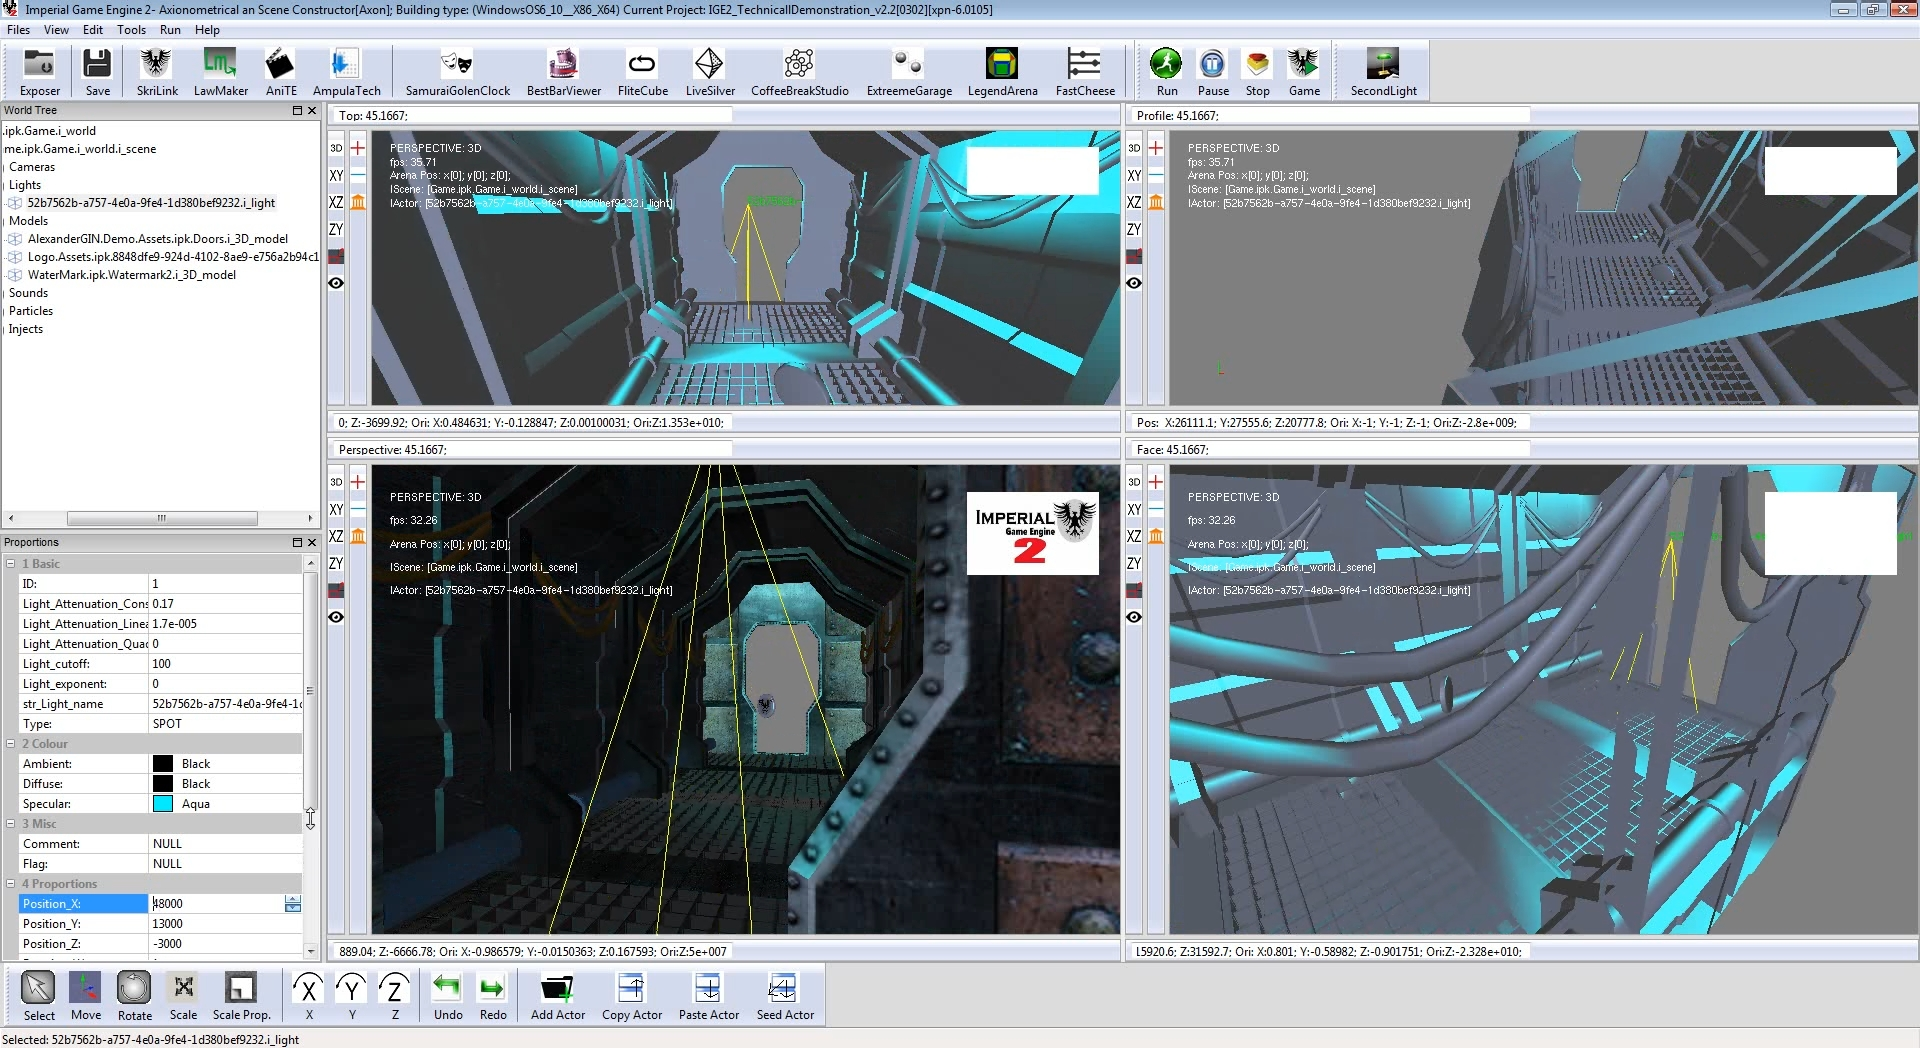 Imperial Game Engine 2 - Портал Video_2021-09-04_005623.wmv_snap